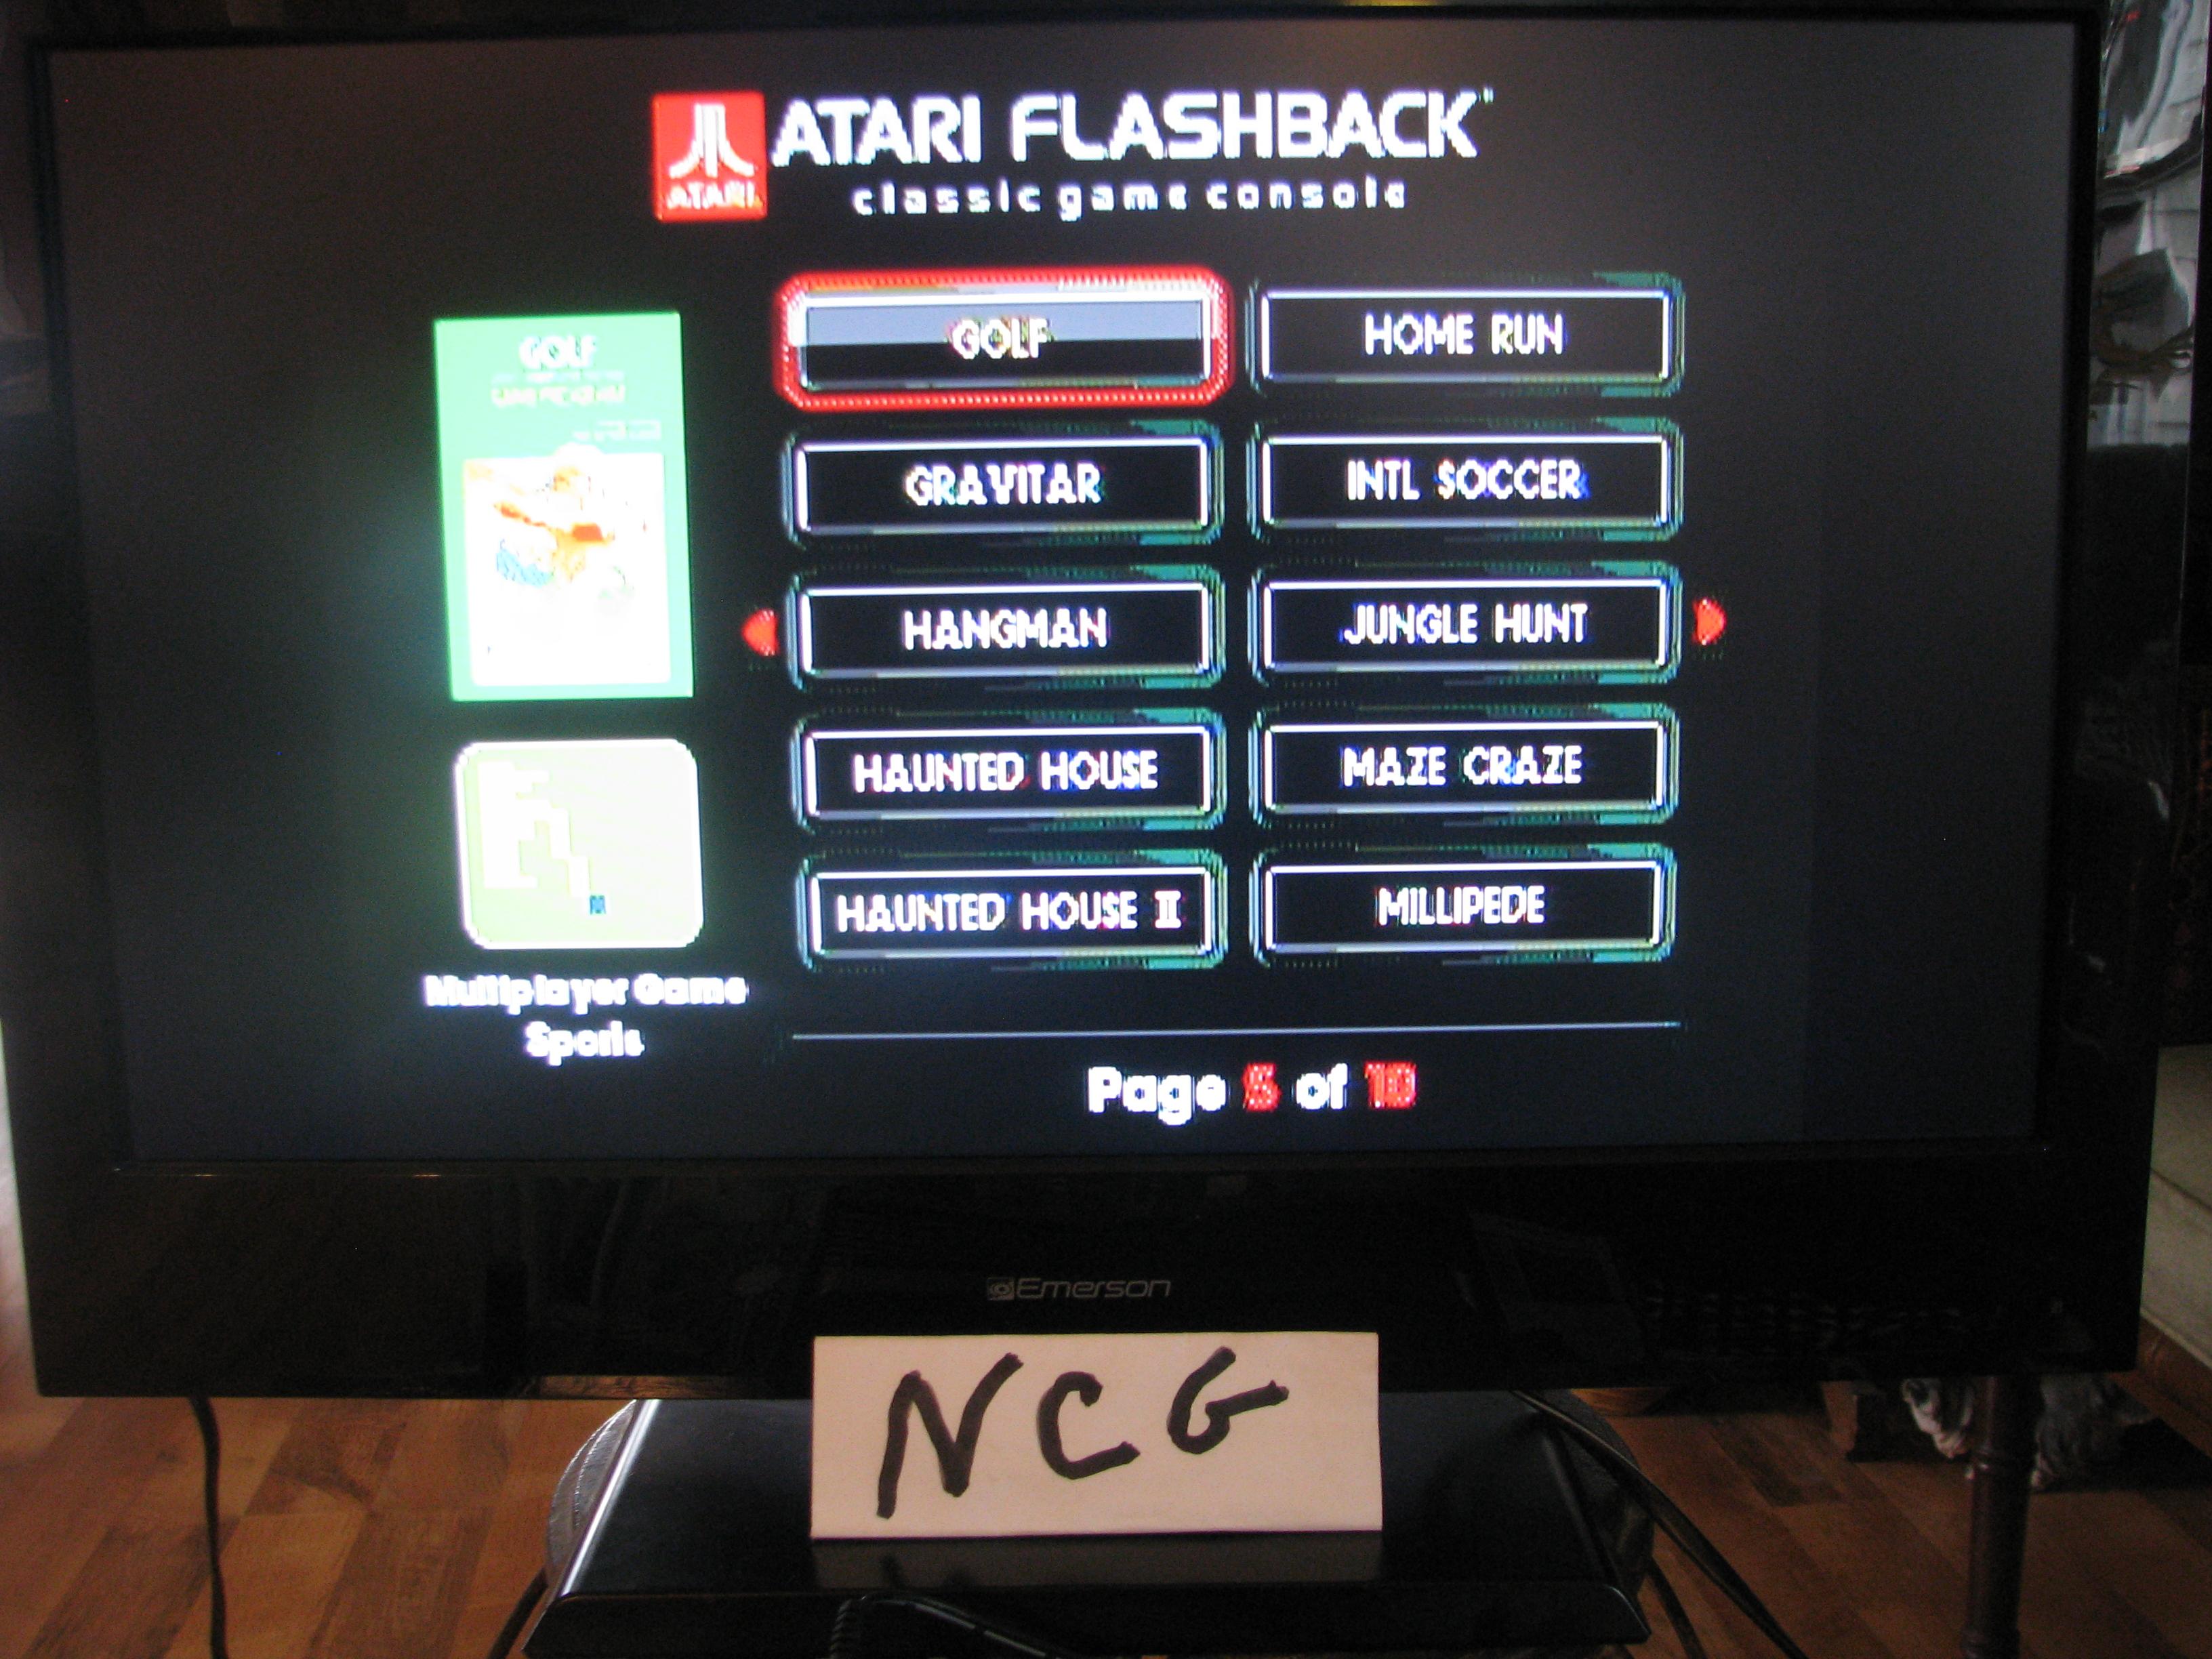 NorthCoastGamer: Golf: Game 1B (Atari Flashback 5) 32 points on 2015-01-10 20:15:31